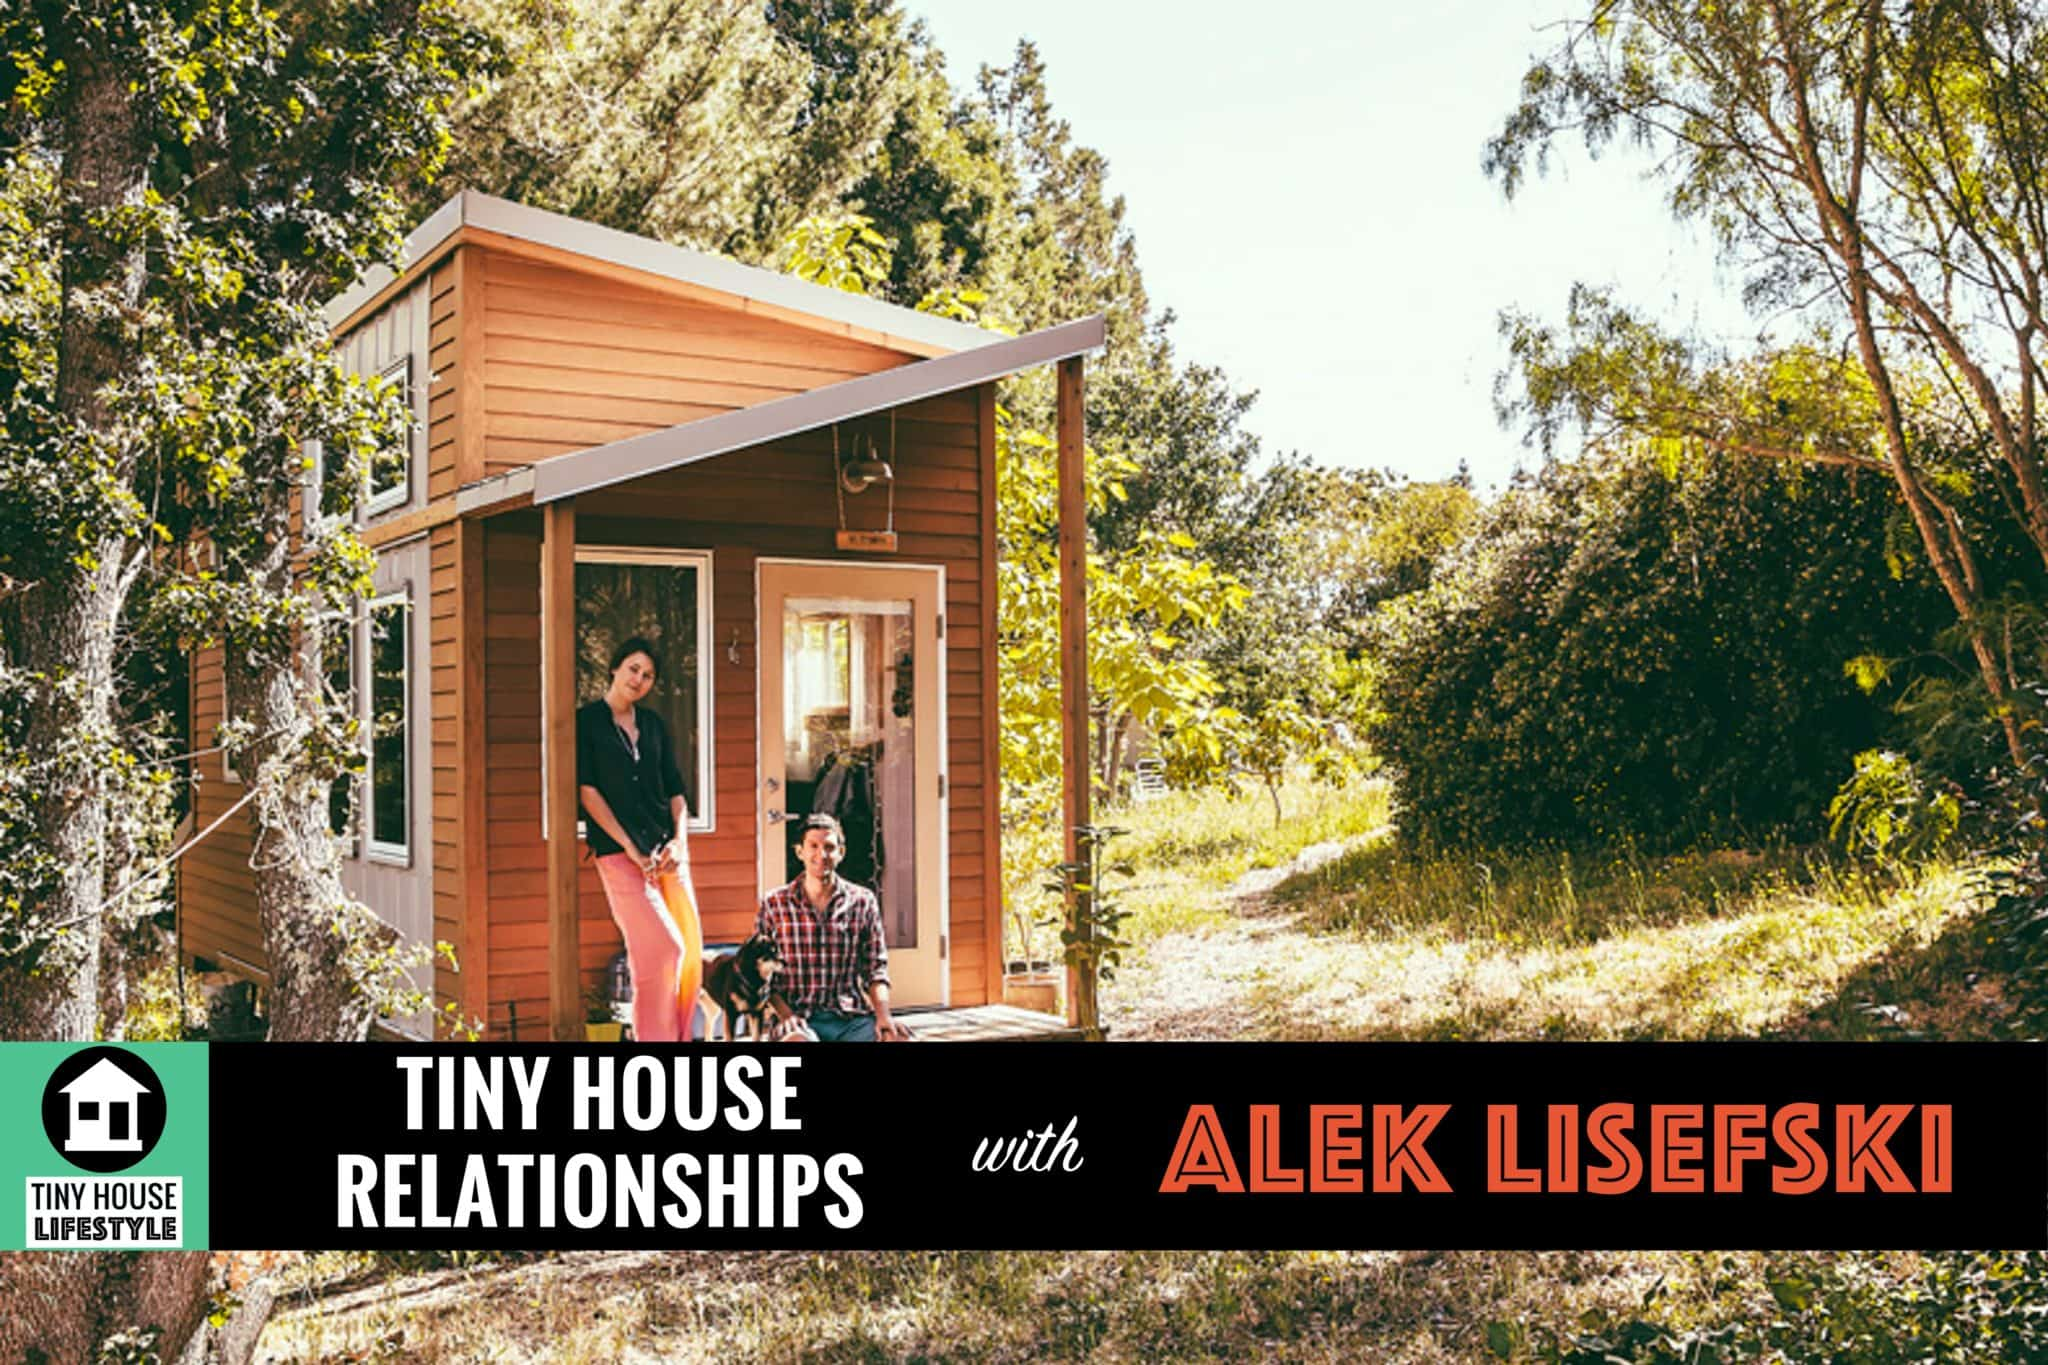 Alek Lisefski Tiny House how tiny house living can shape your relationships, career